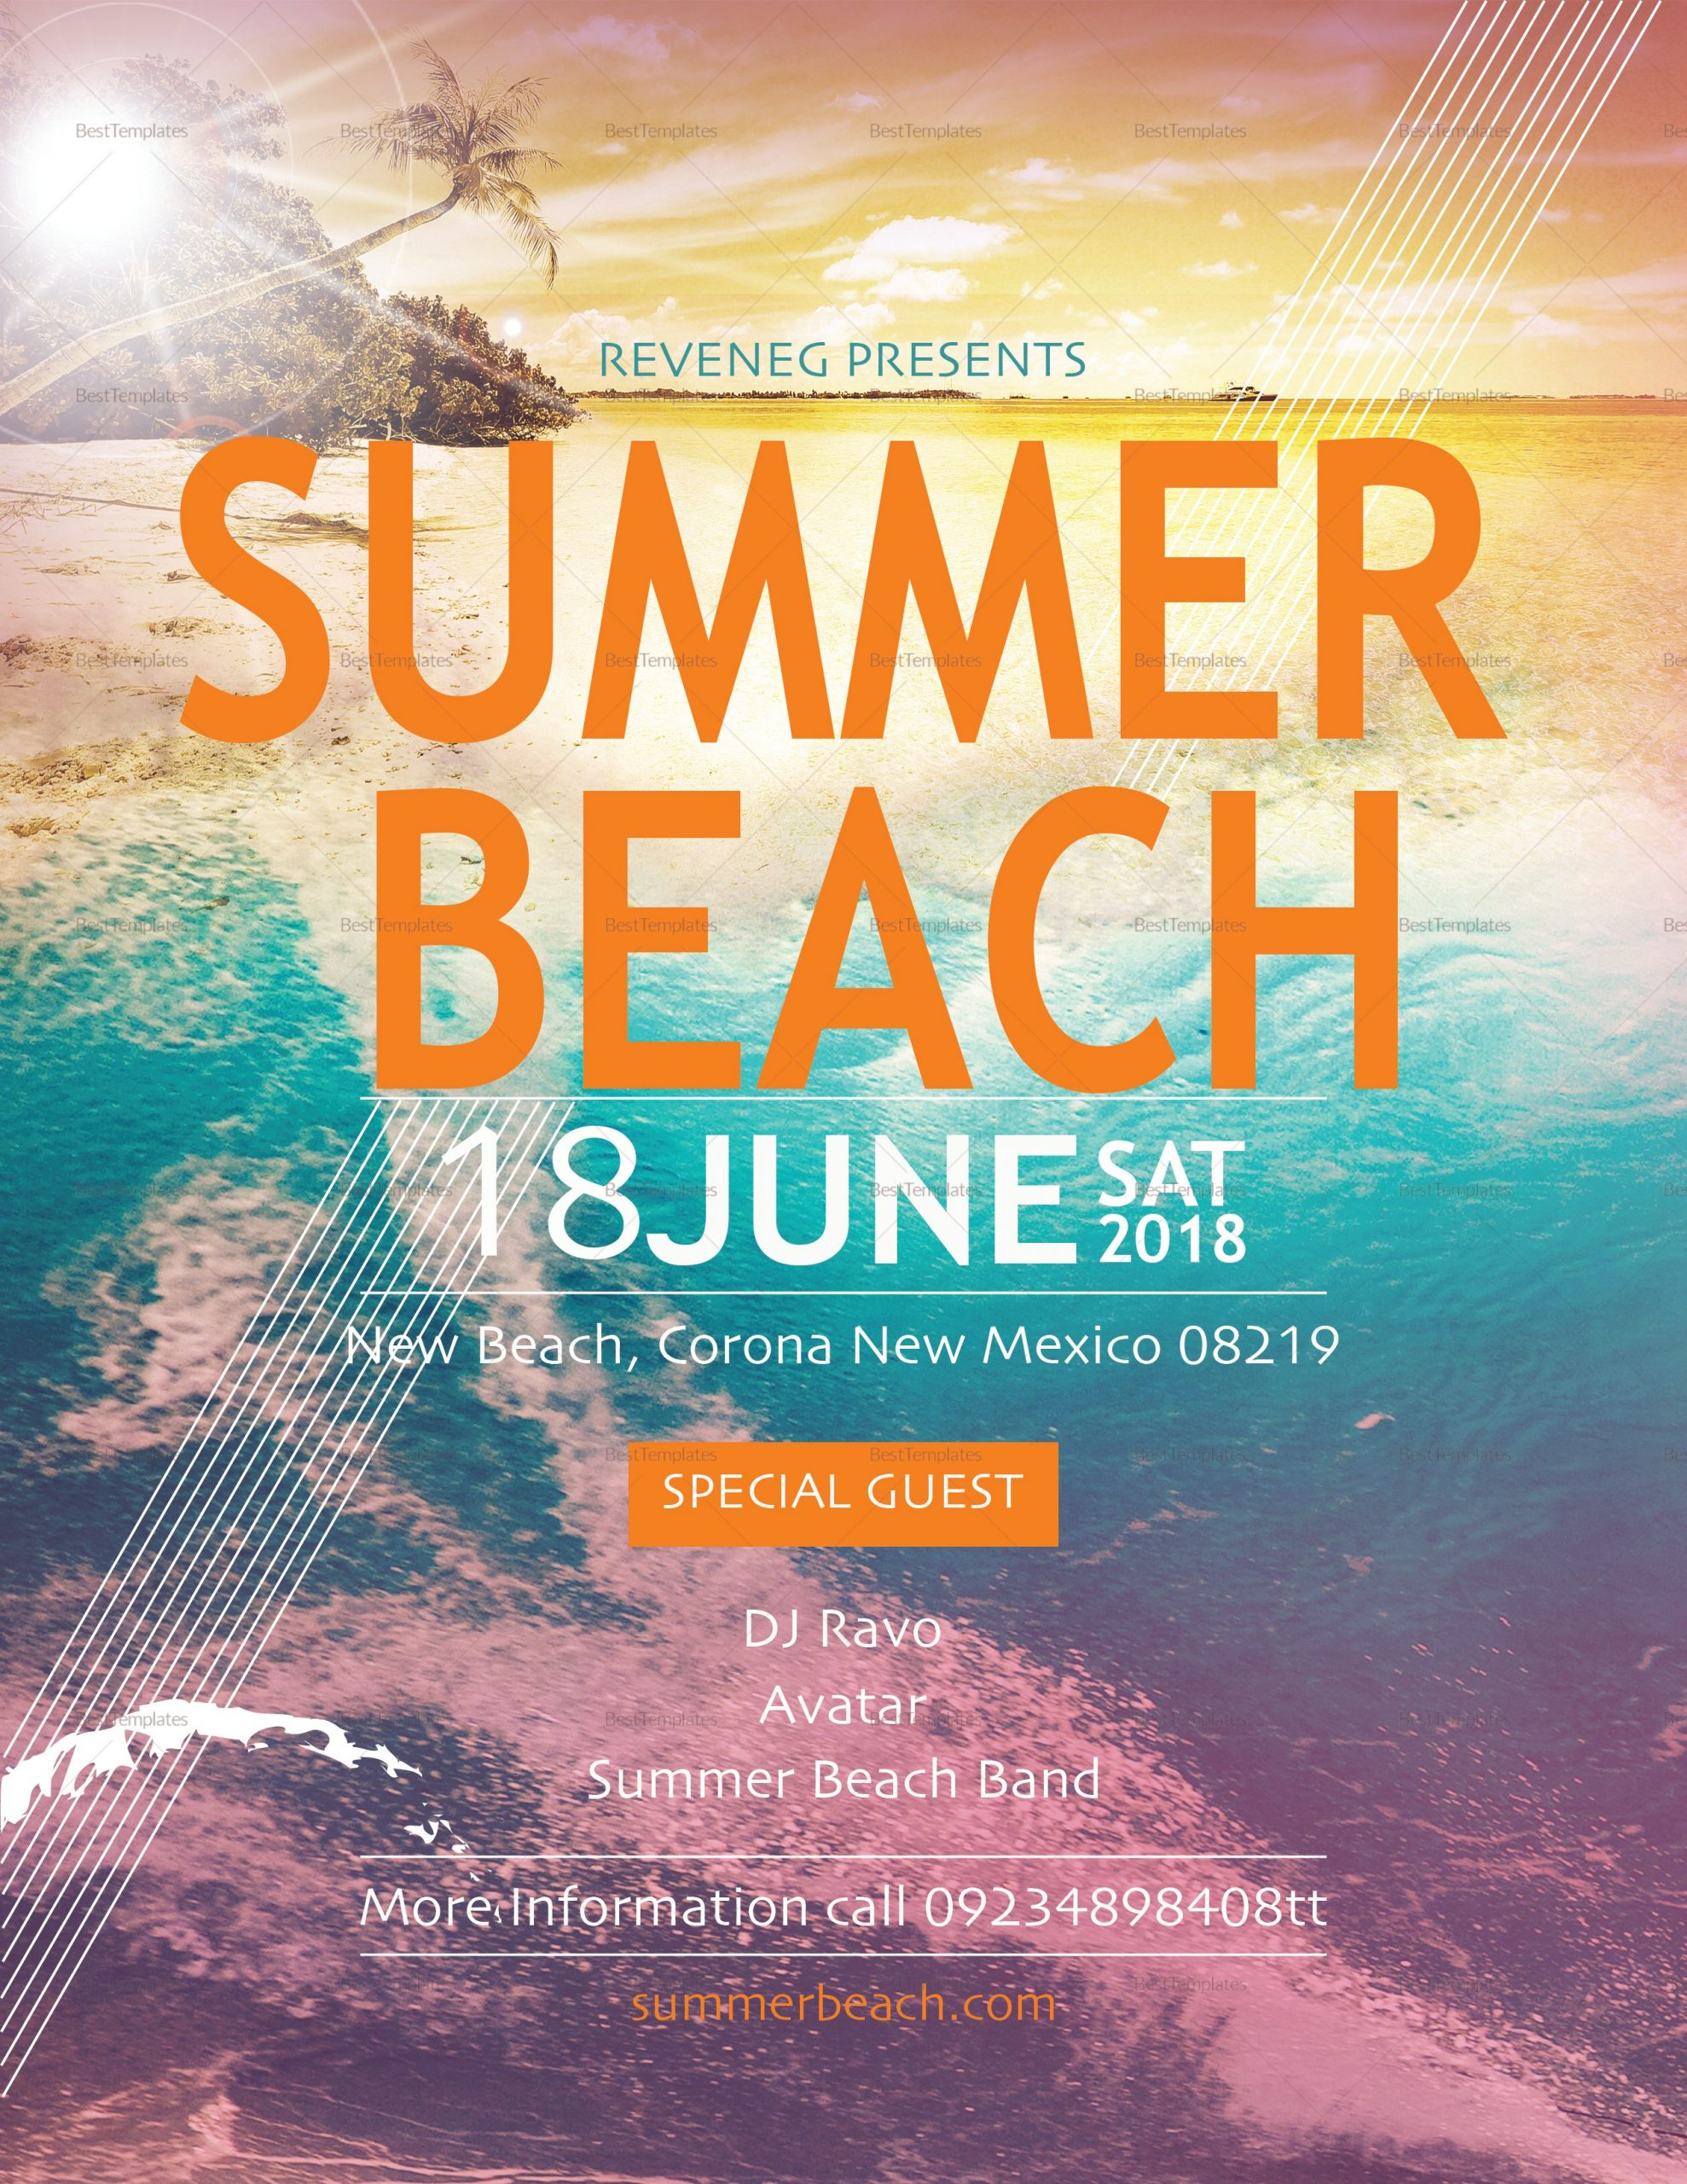 summer flyer template  Summer Beach Flyer Design Template in PSD, Word, Publisher ..